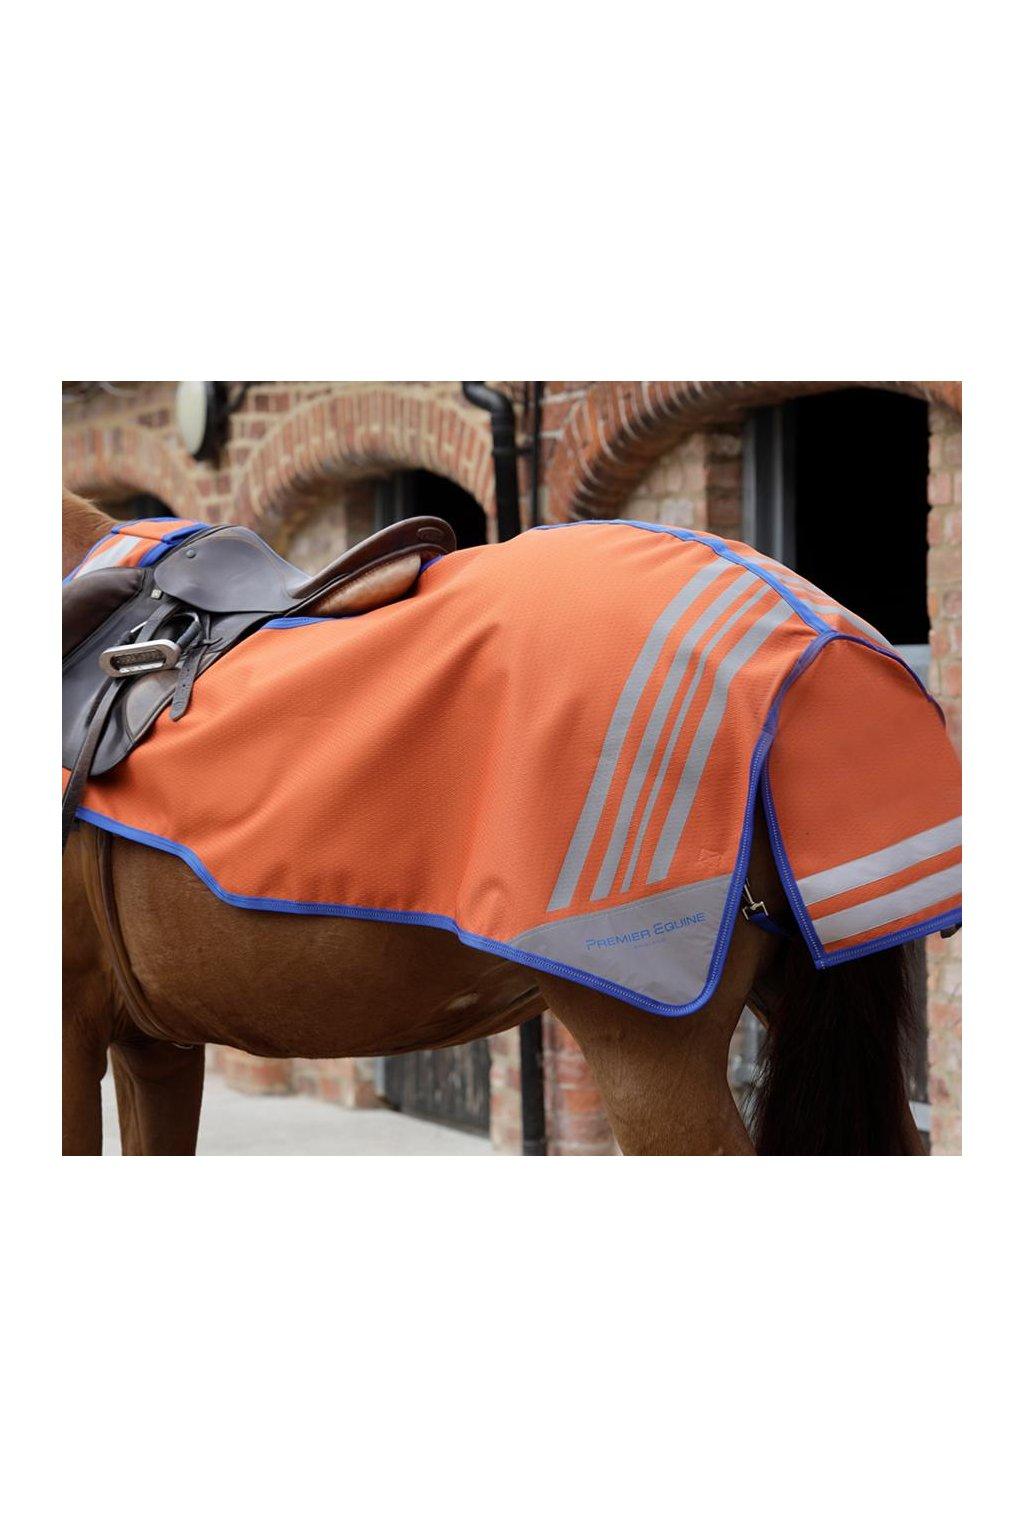 AW18 Stratus Exercise Sheet Fabric Close Up Main Image RGB 72 zoom